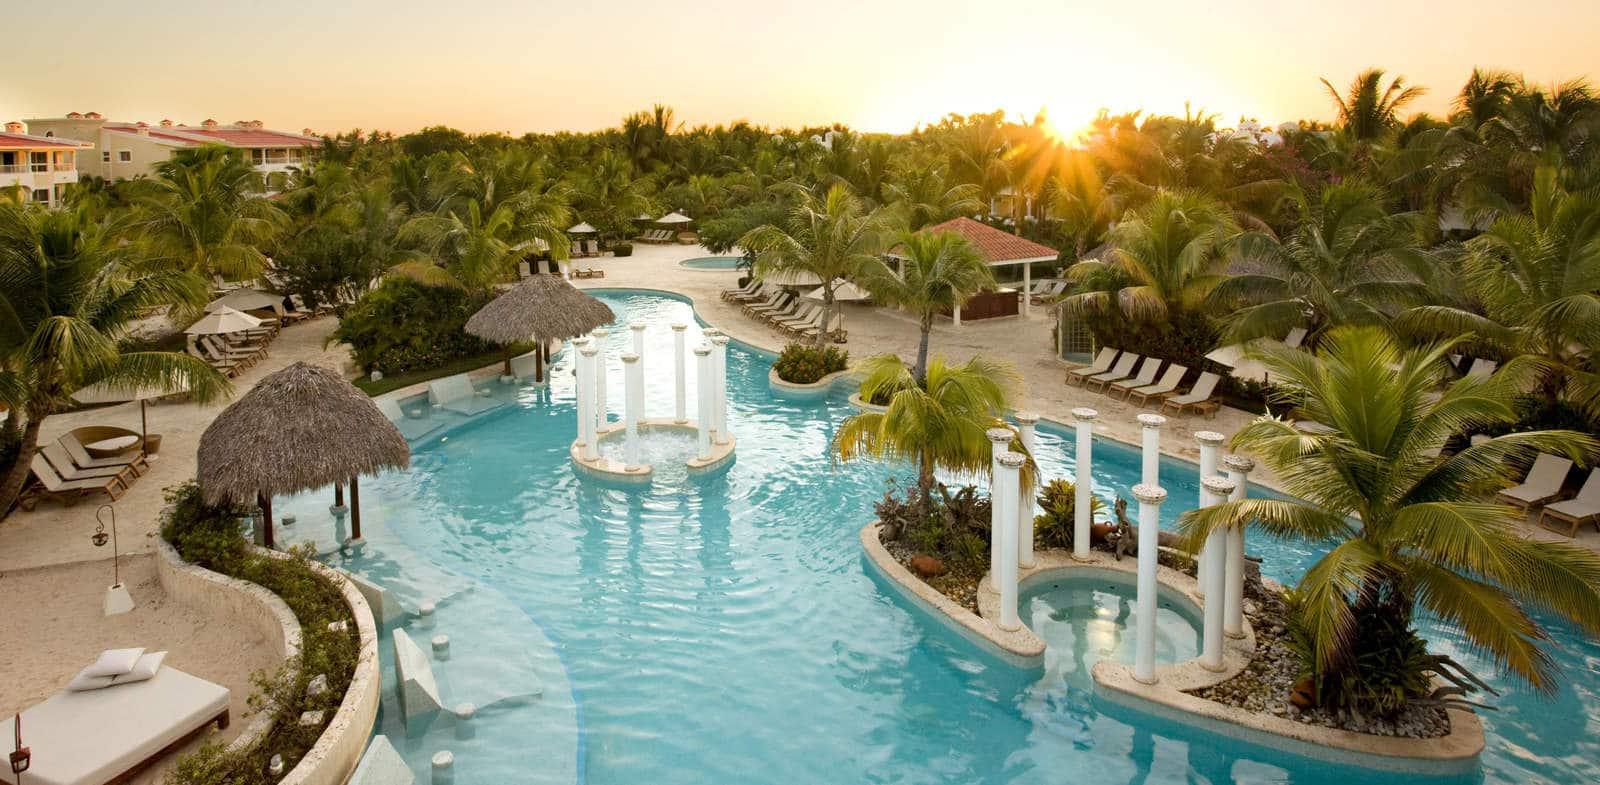 The Level At Melia Caribe Beach Resort